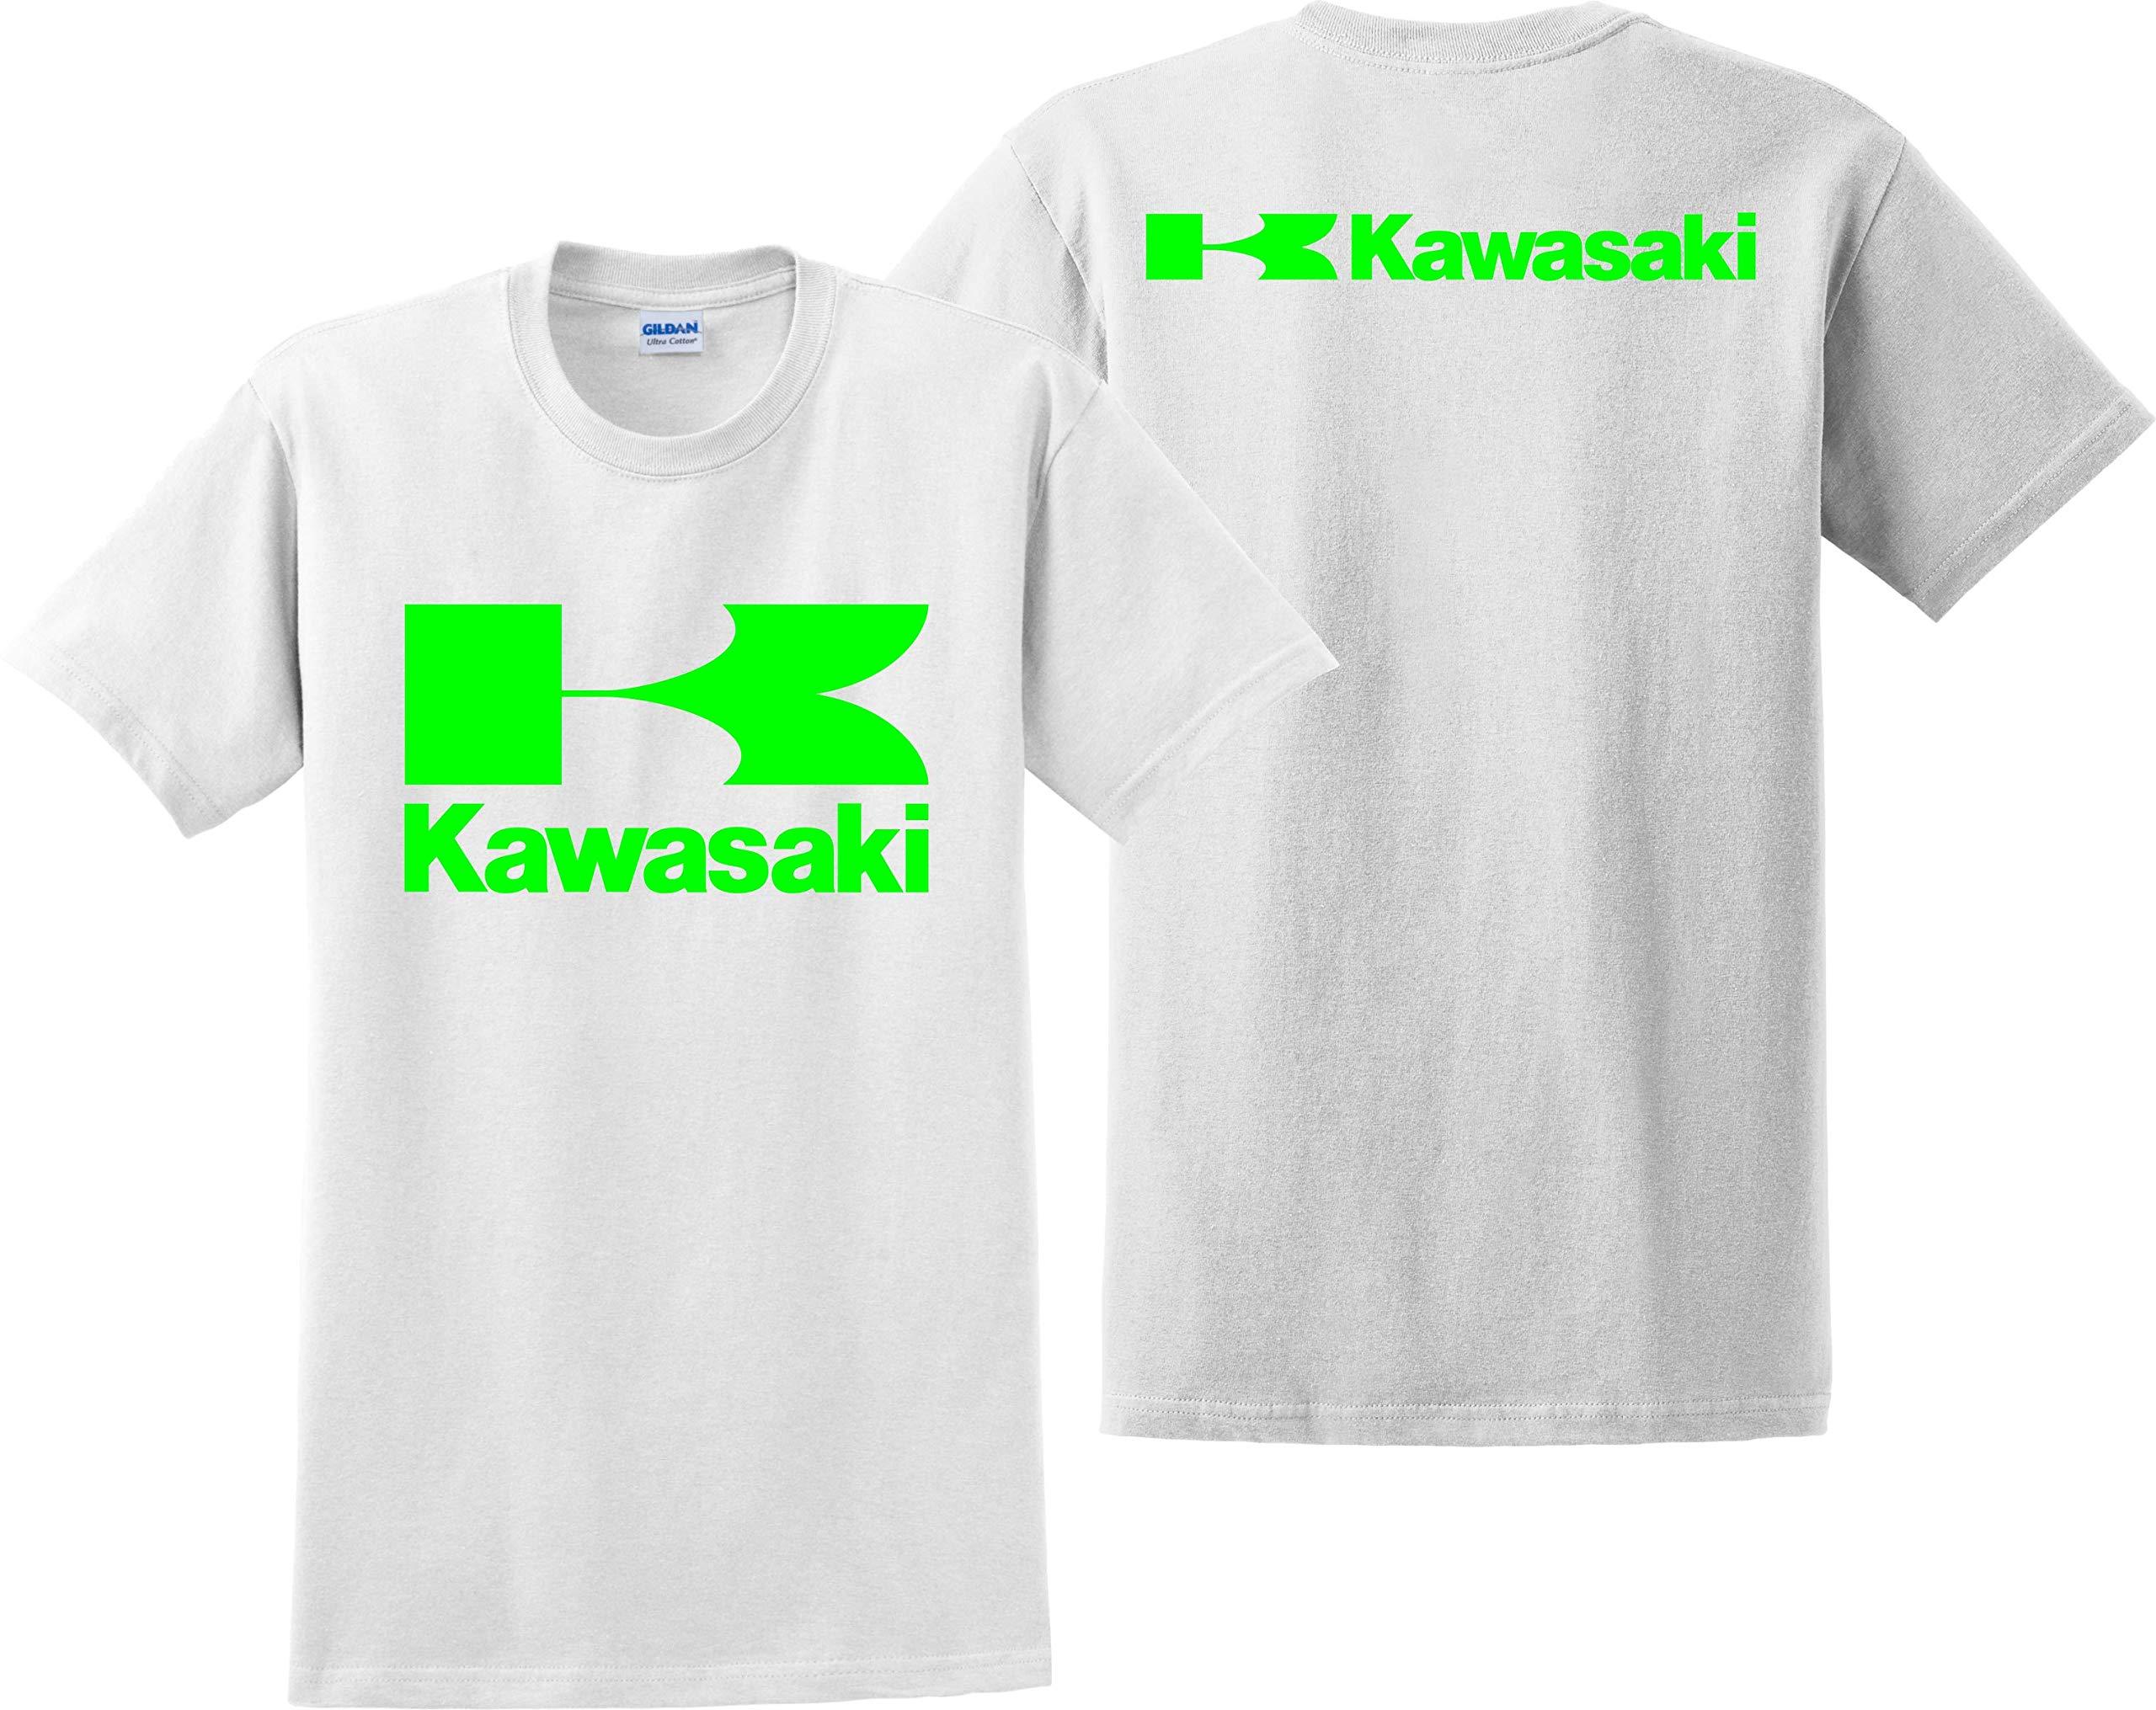 Shirt Express Kawasaki Hooded Sweatshirt Super Bikes Ninja Motorcycles JDM Unisex Hoodie